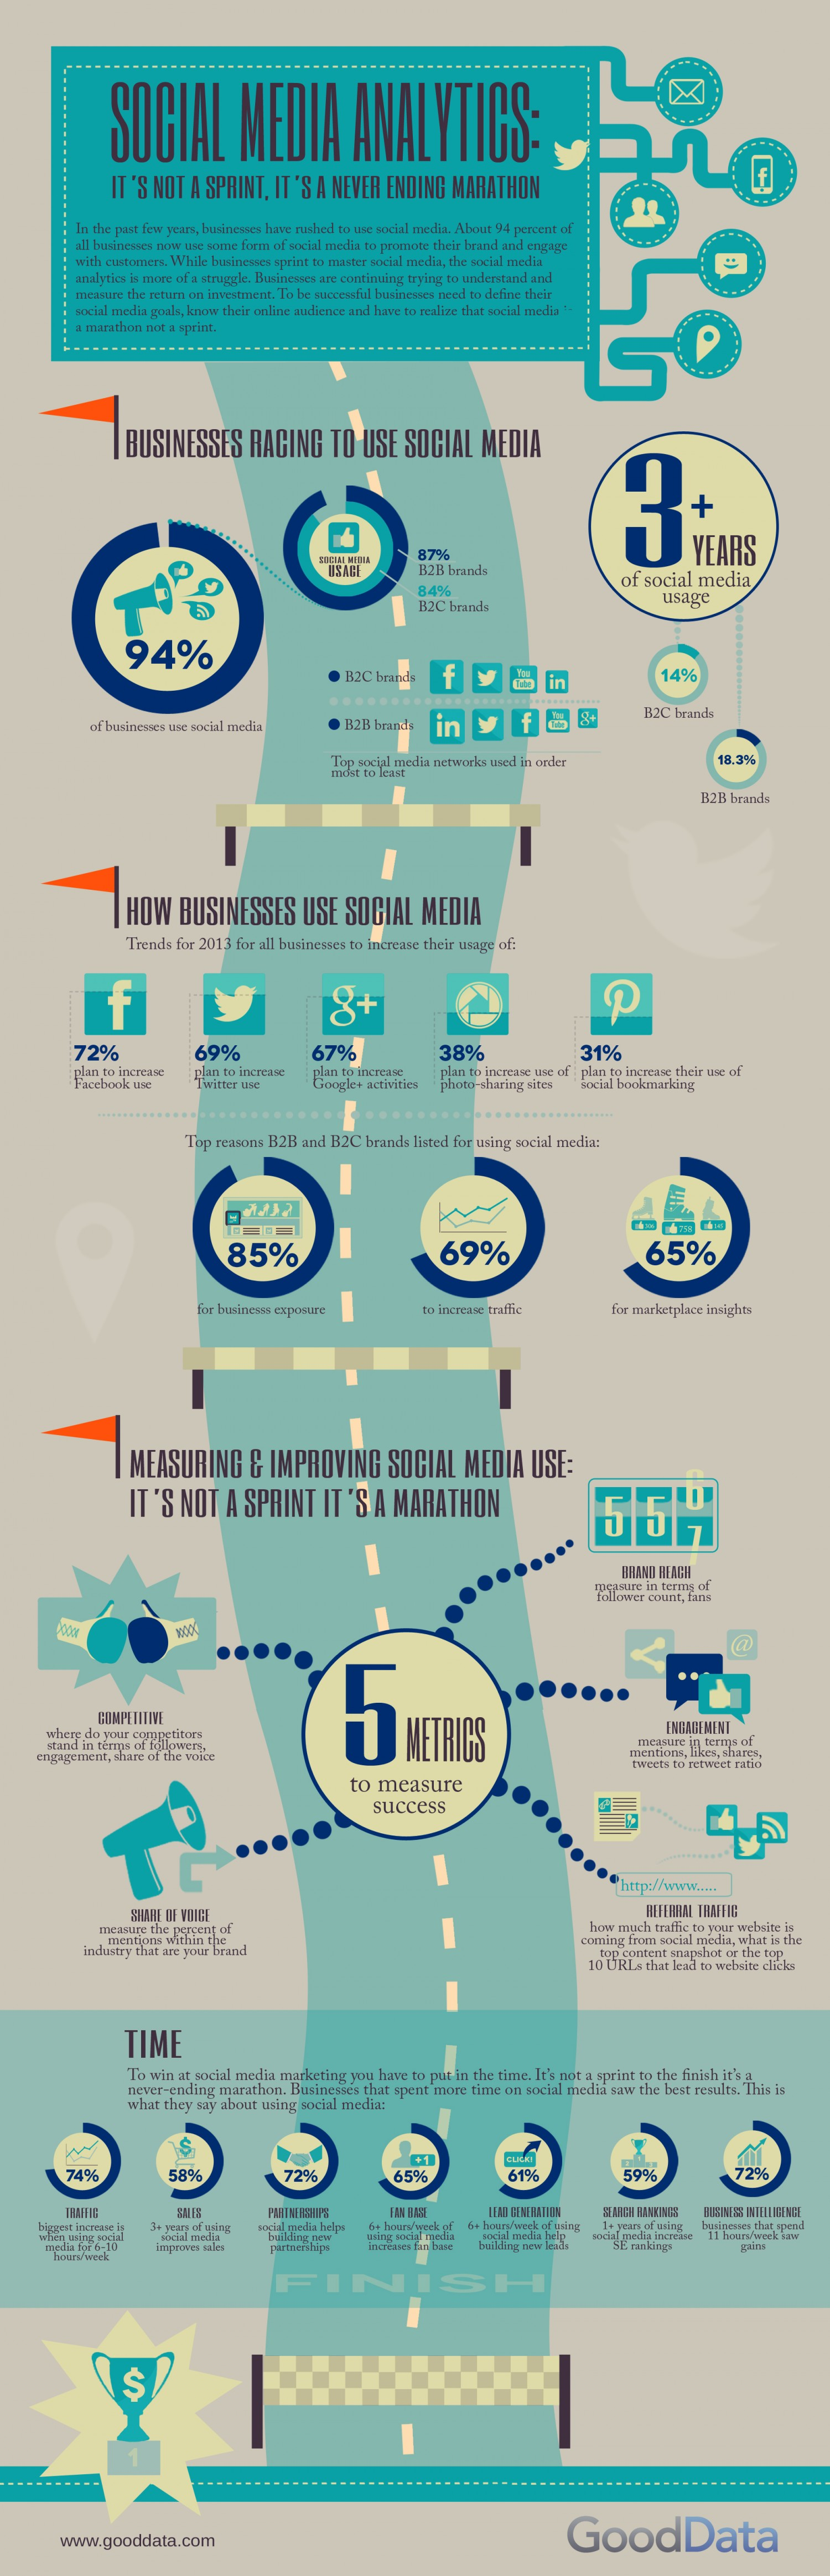 social-media-analytics_5288067249f50_w1500